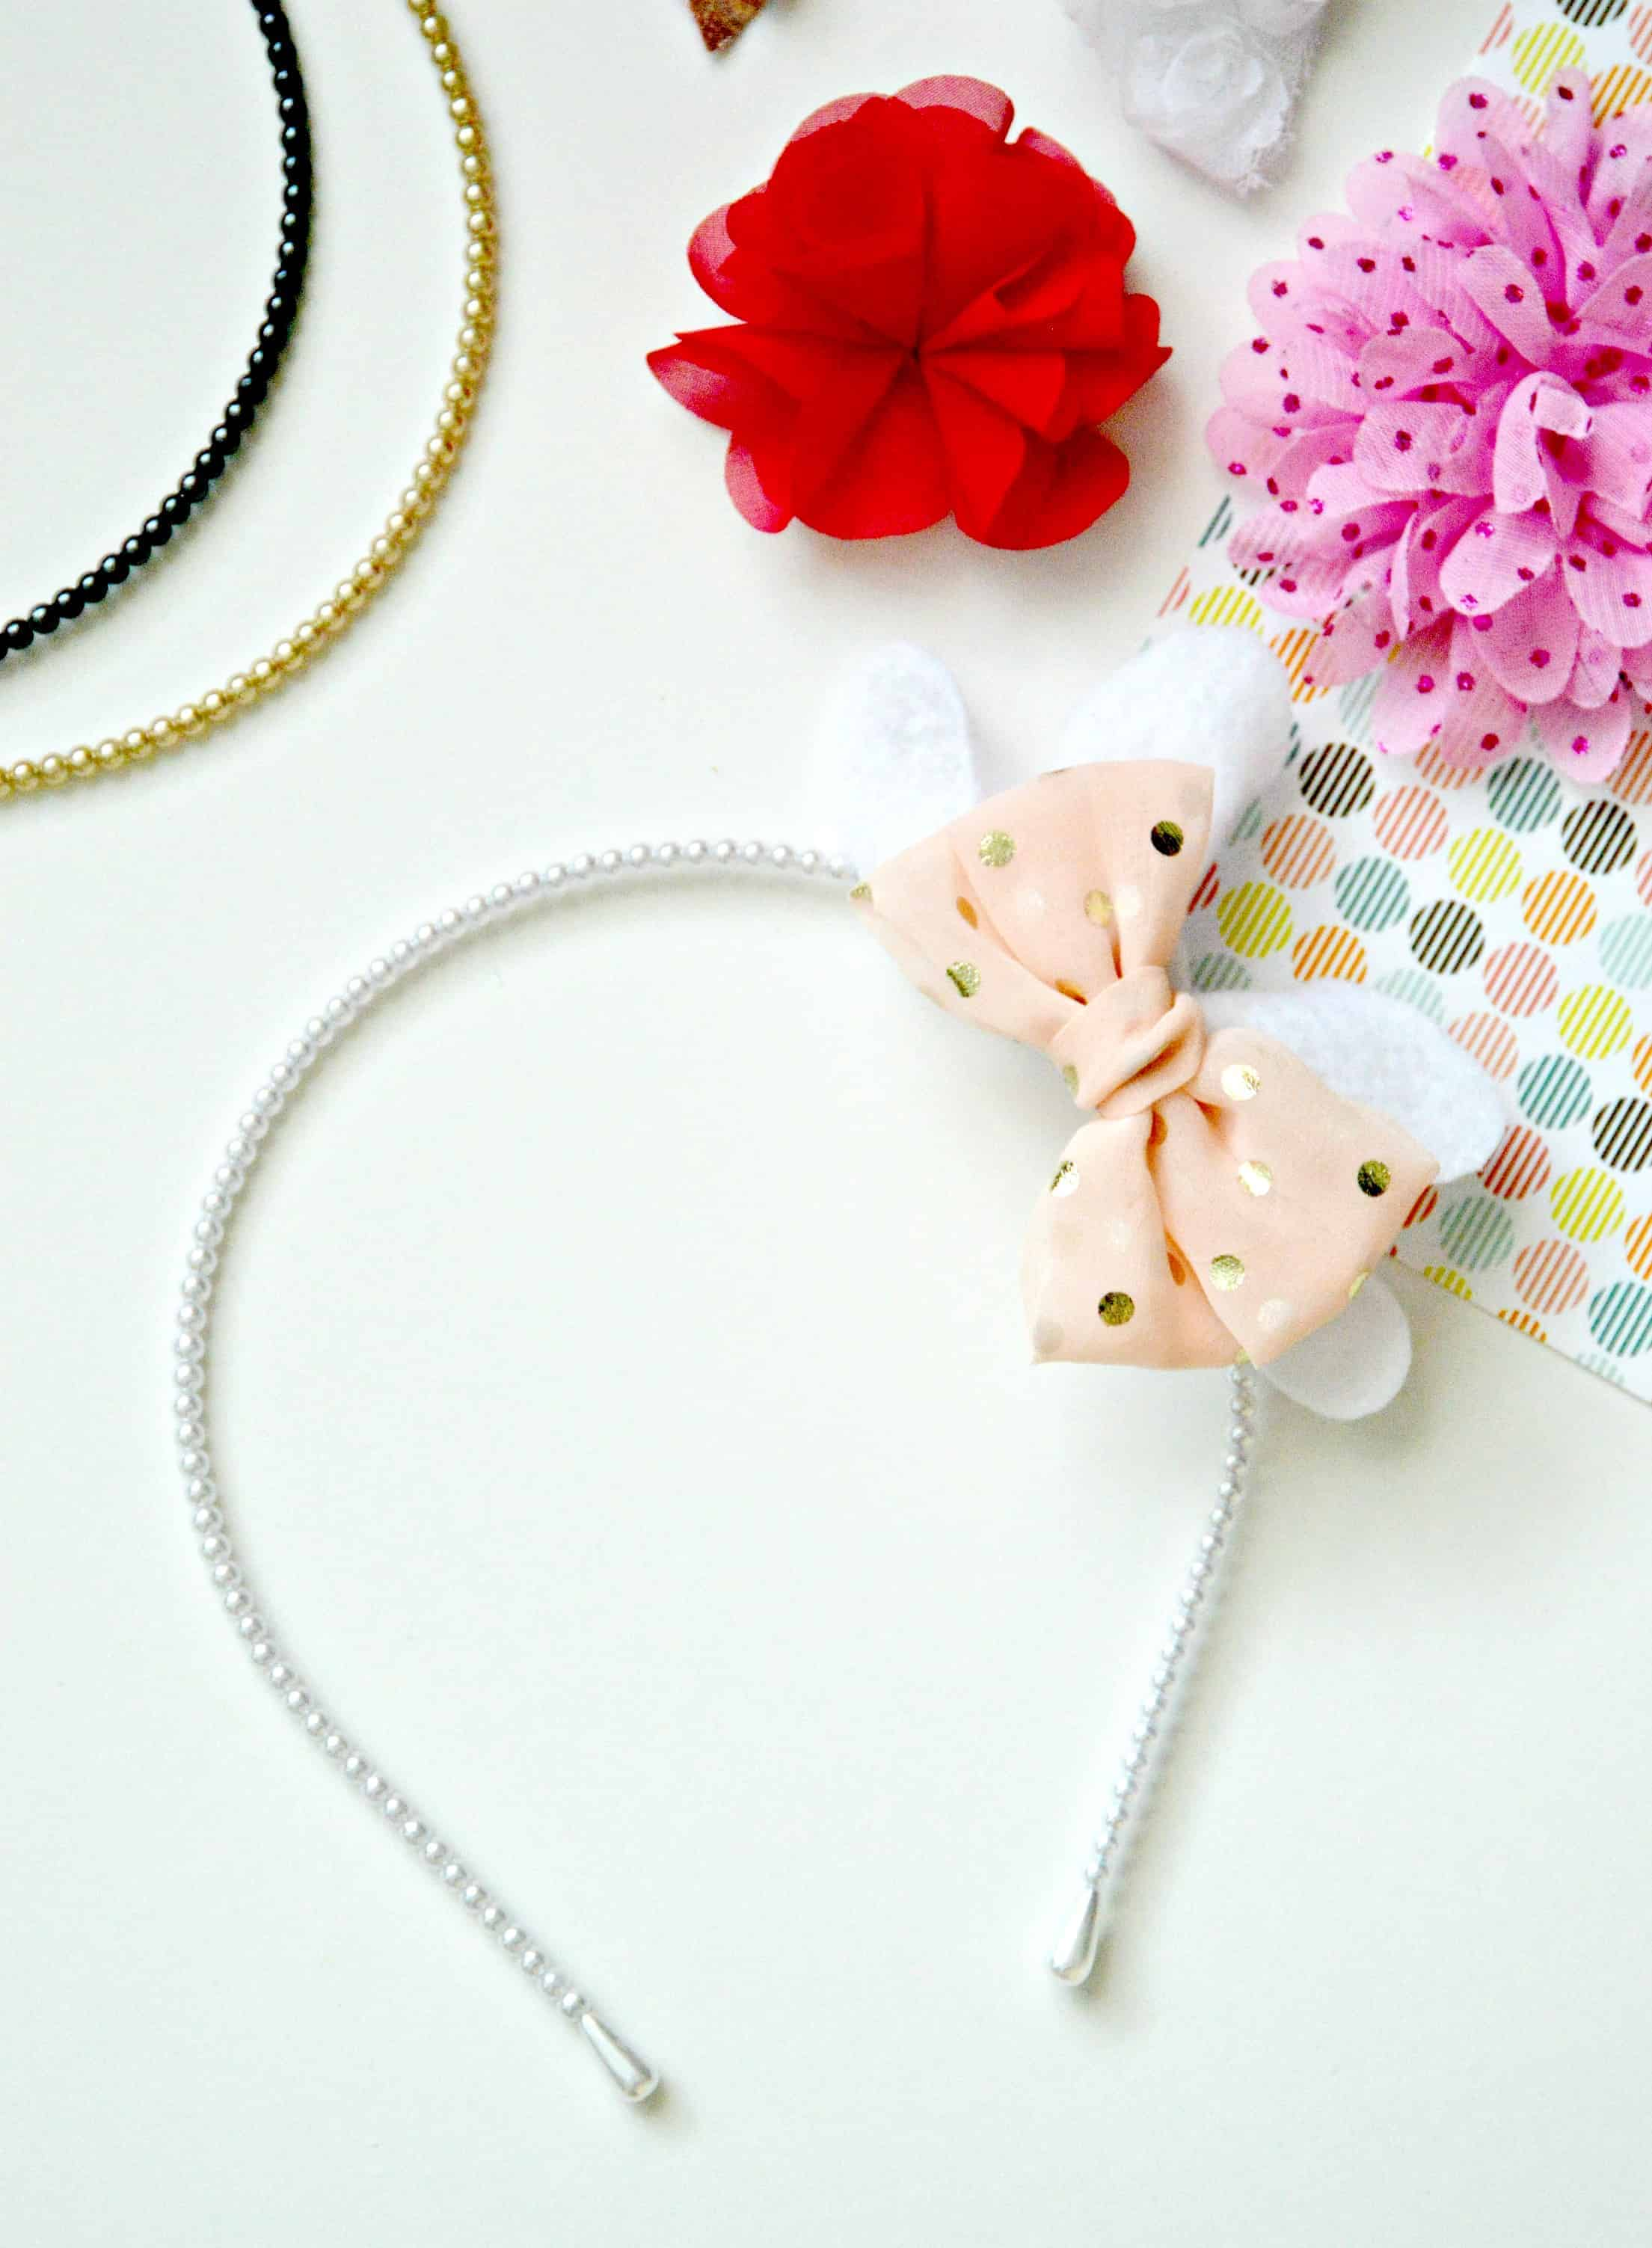 Easy To Make DIY Headband For Spring